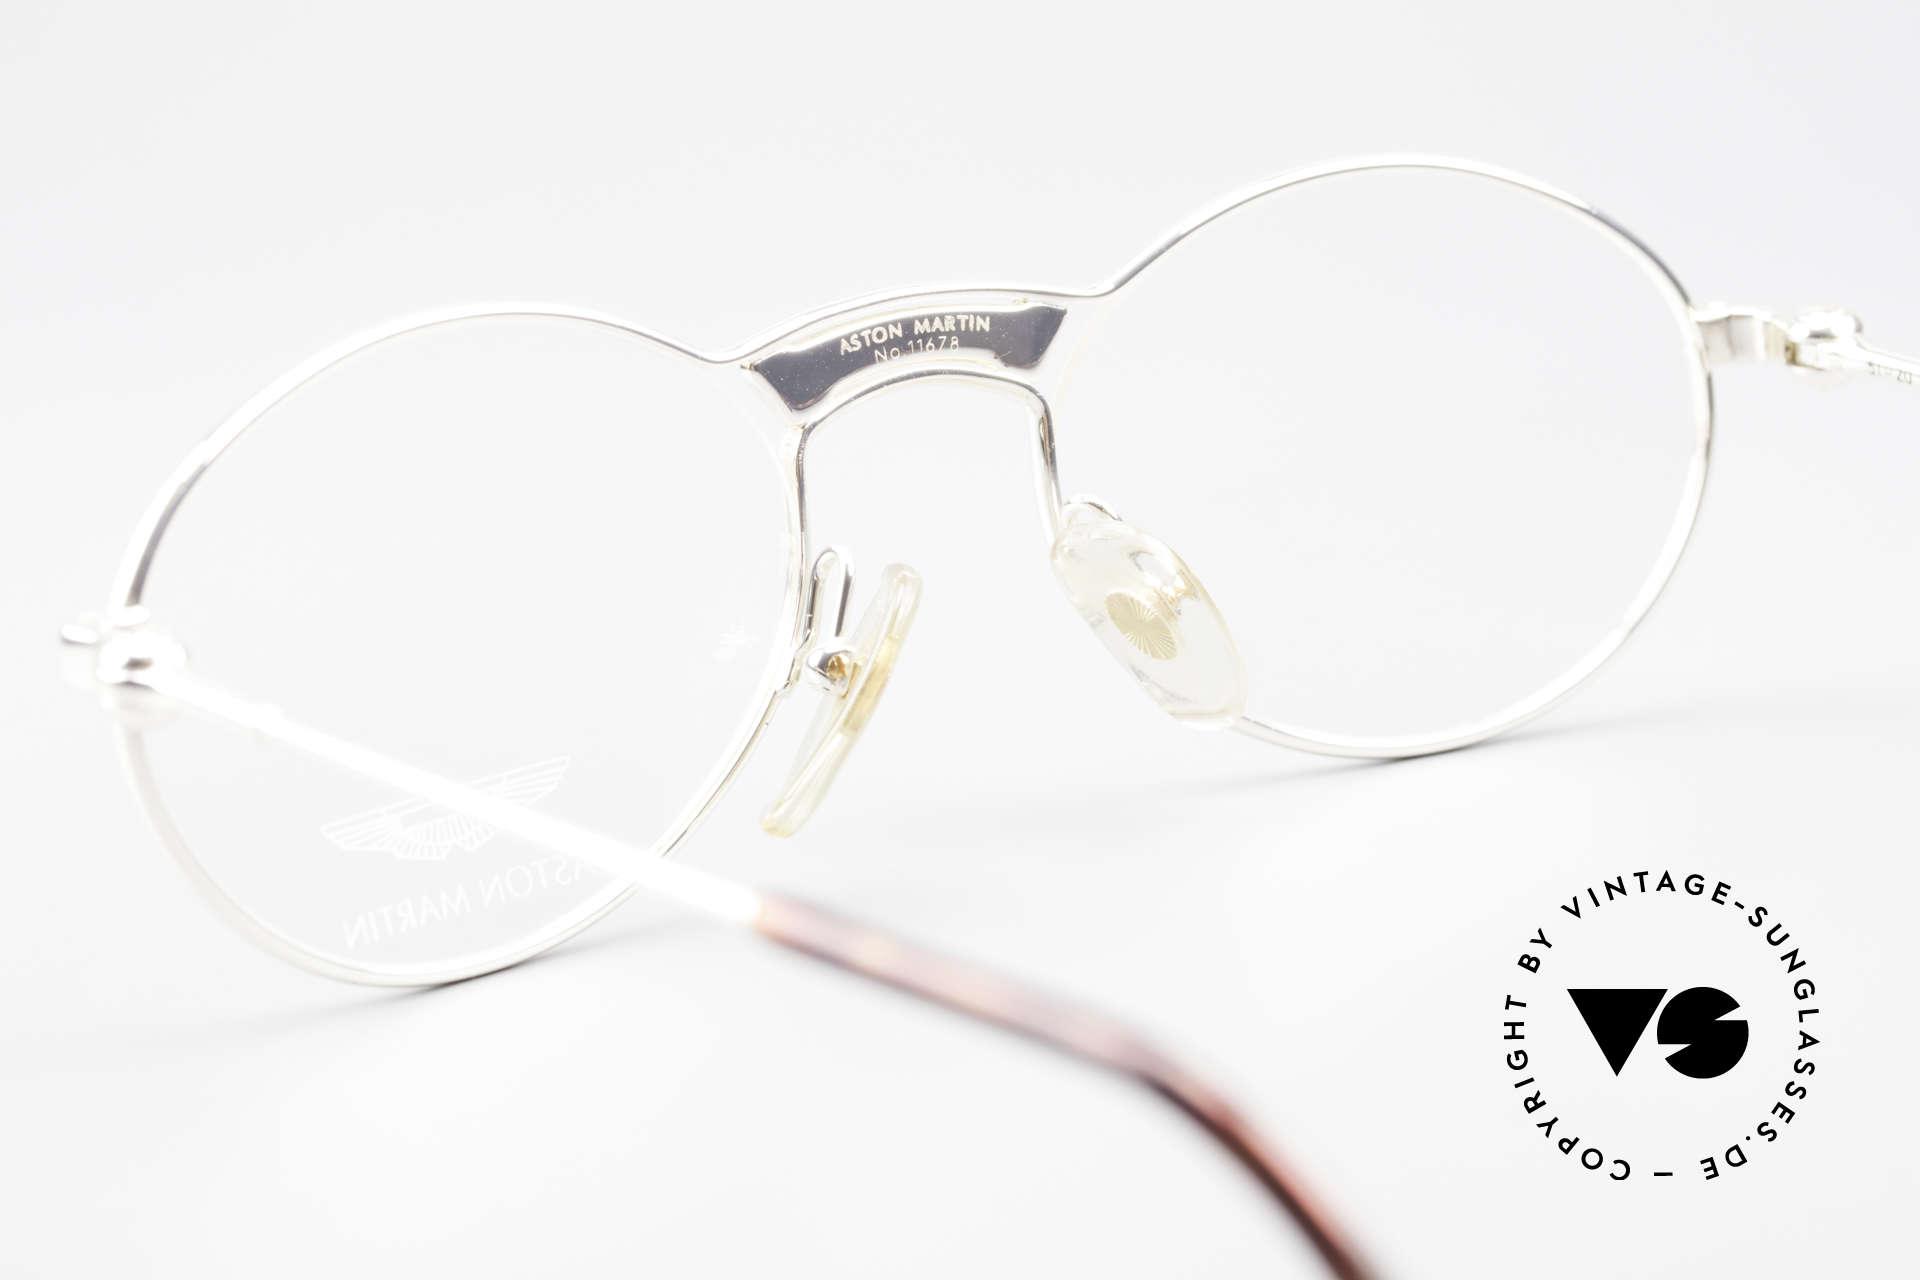 Aston Martin AM01 Oval Glasses James Bond Style, NO RETRO design glasses, but a unique 1990's original!, Made for Men